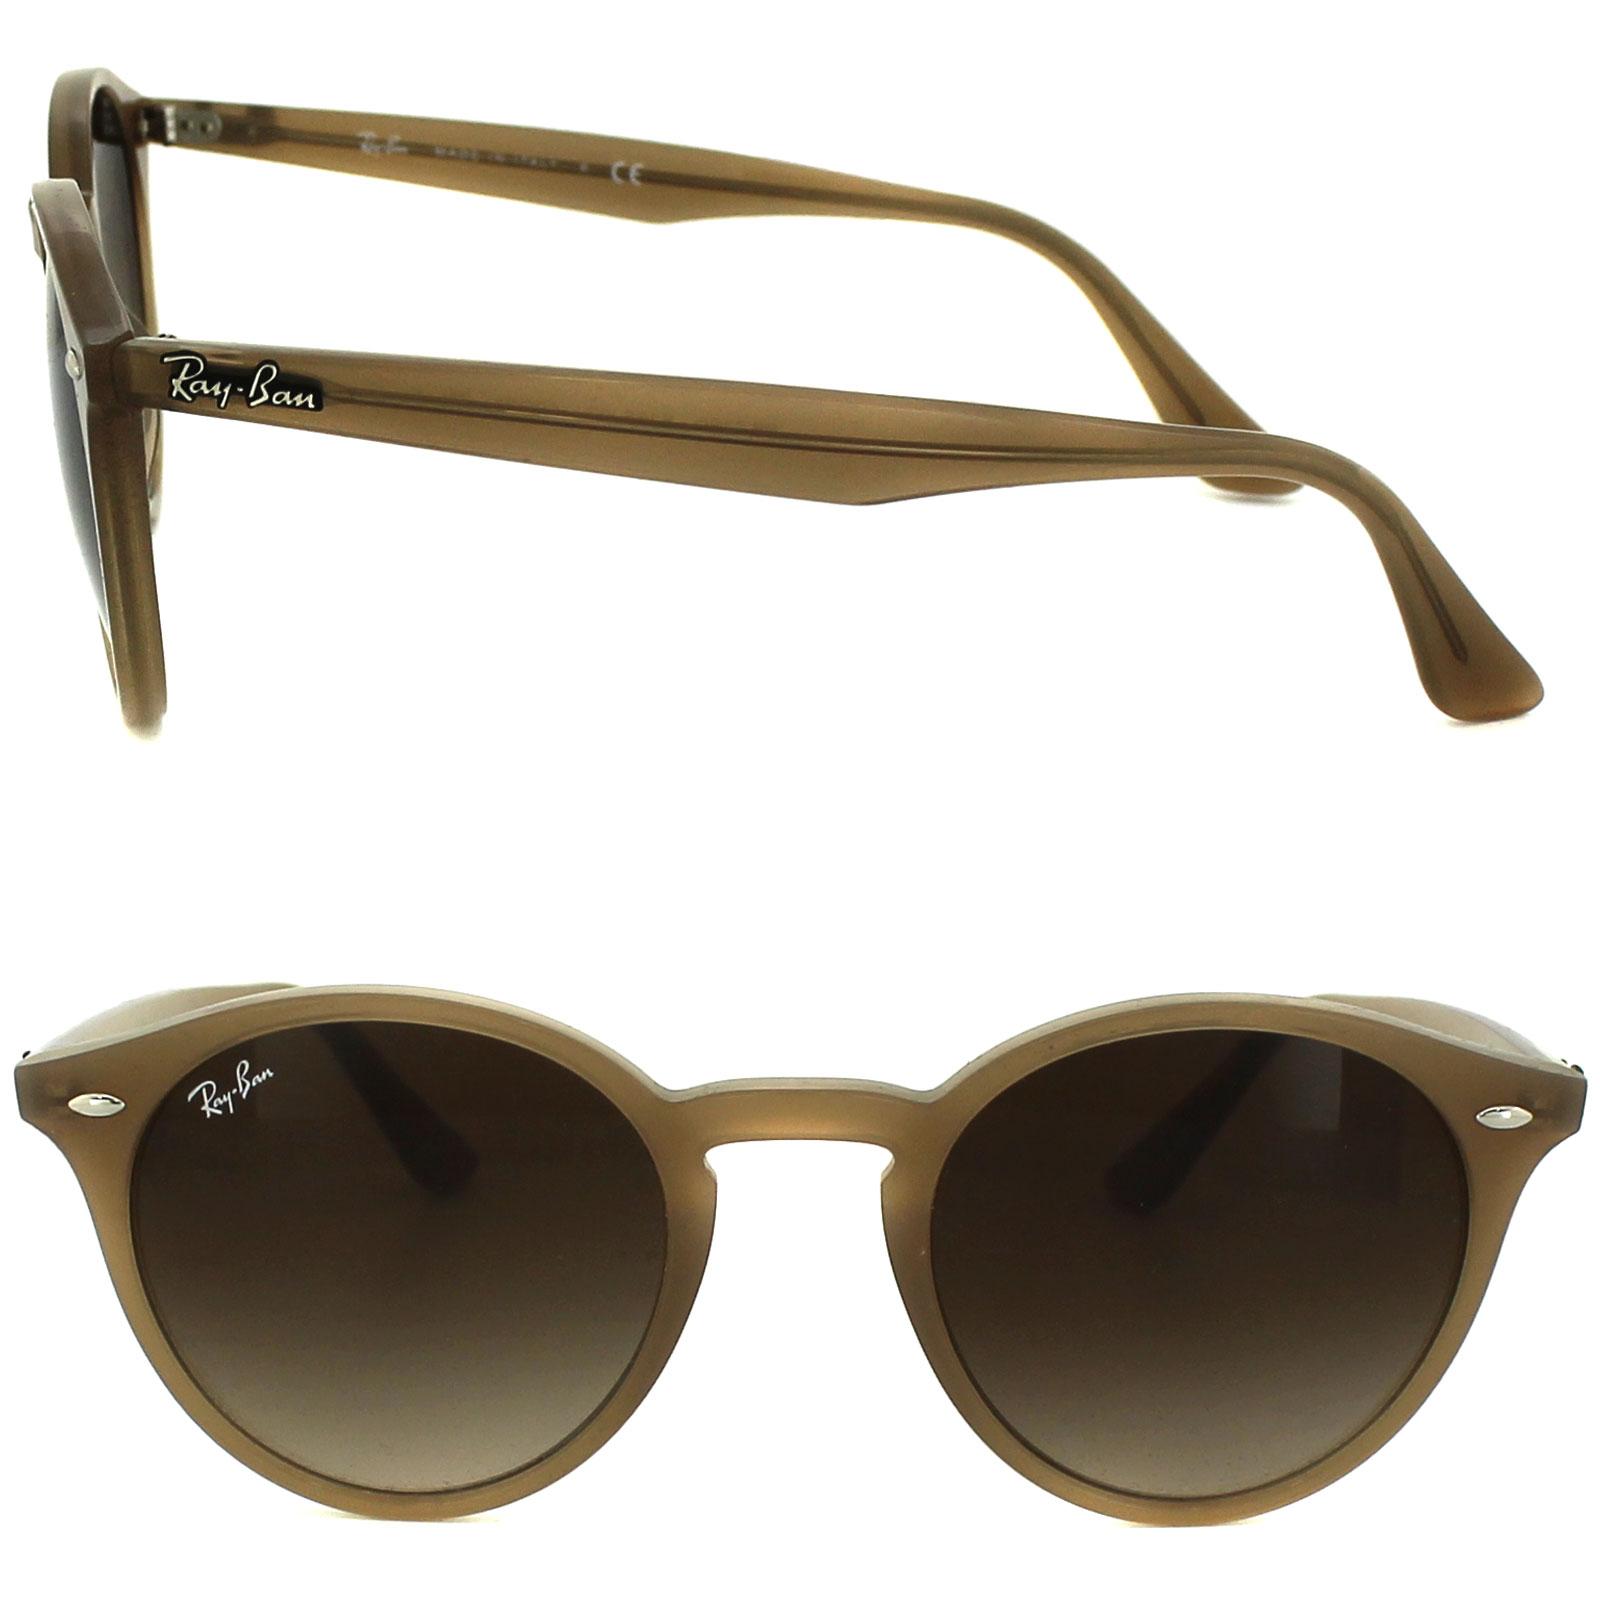 cheap ray ban 2180 sunglasses discounted sunglasses. Black Bedroom Furniture Sets. Home Design Ideas